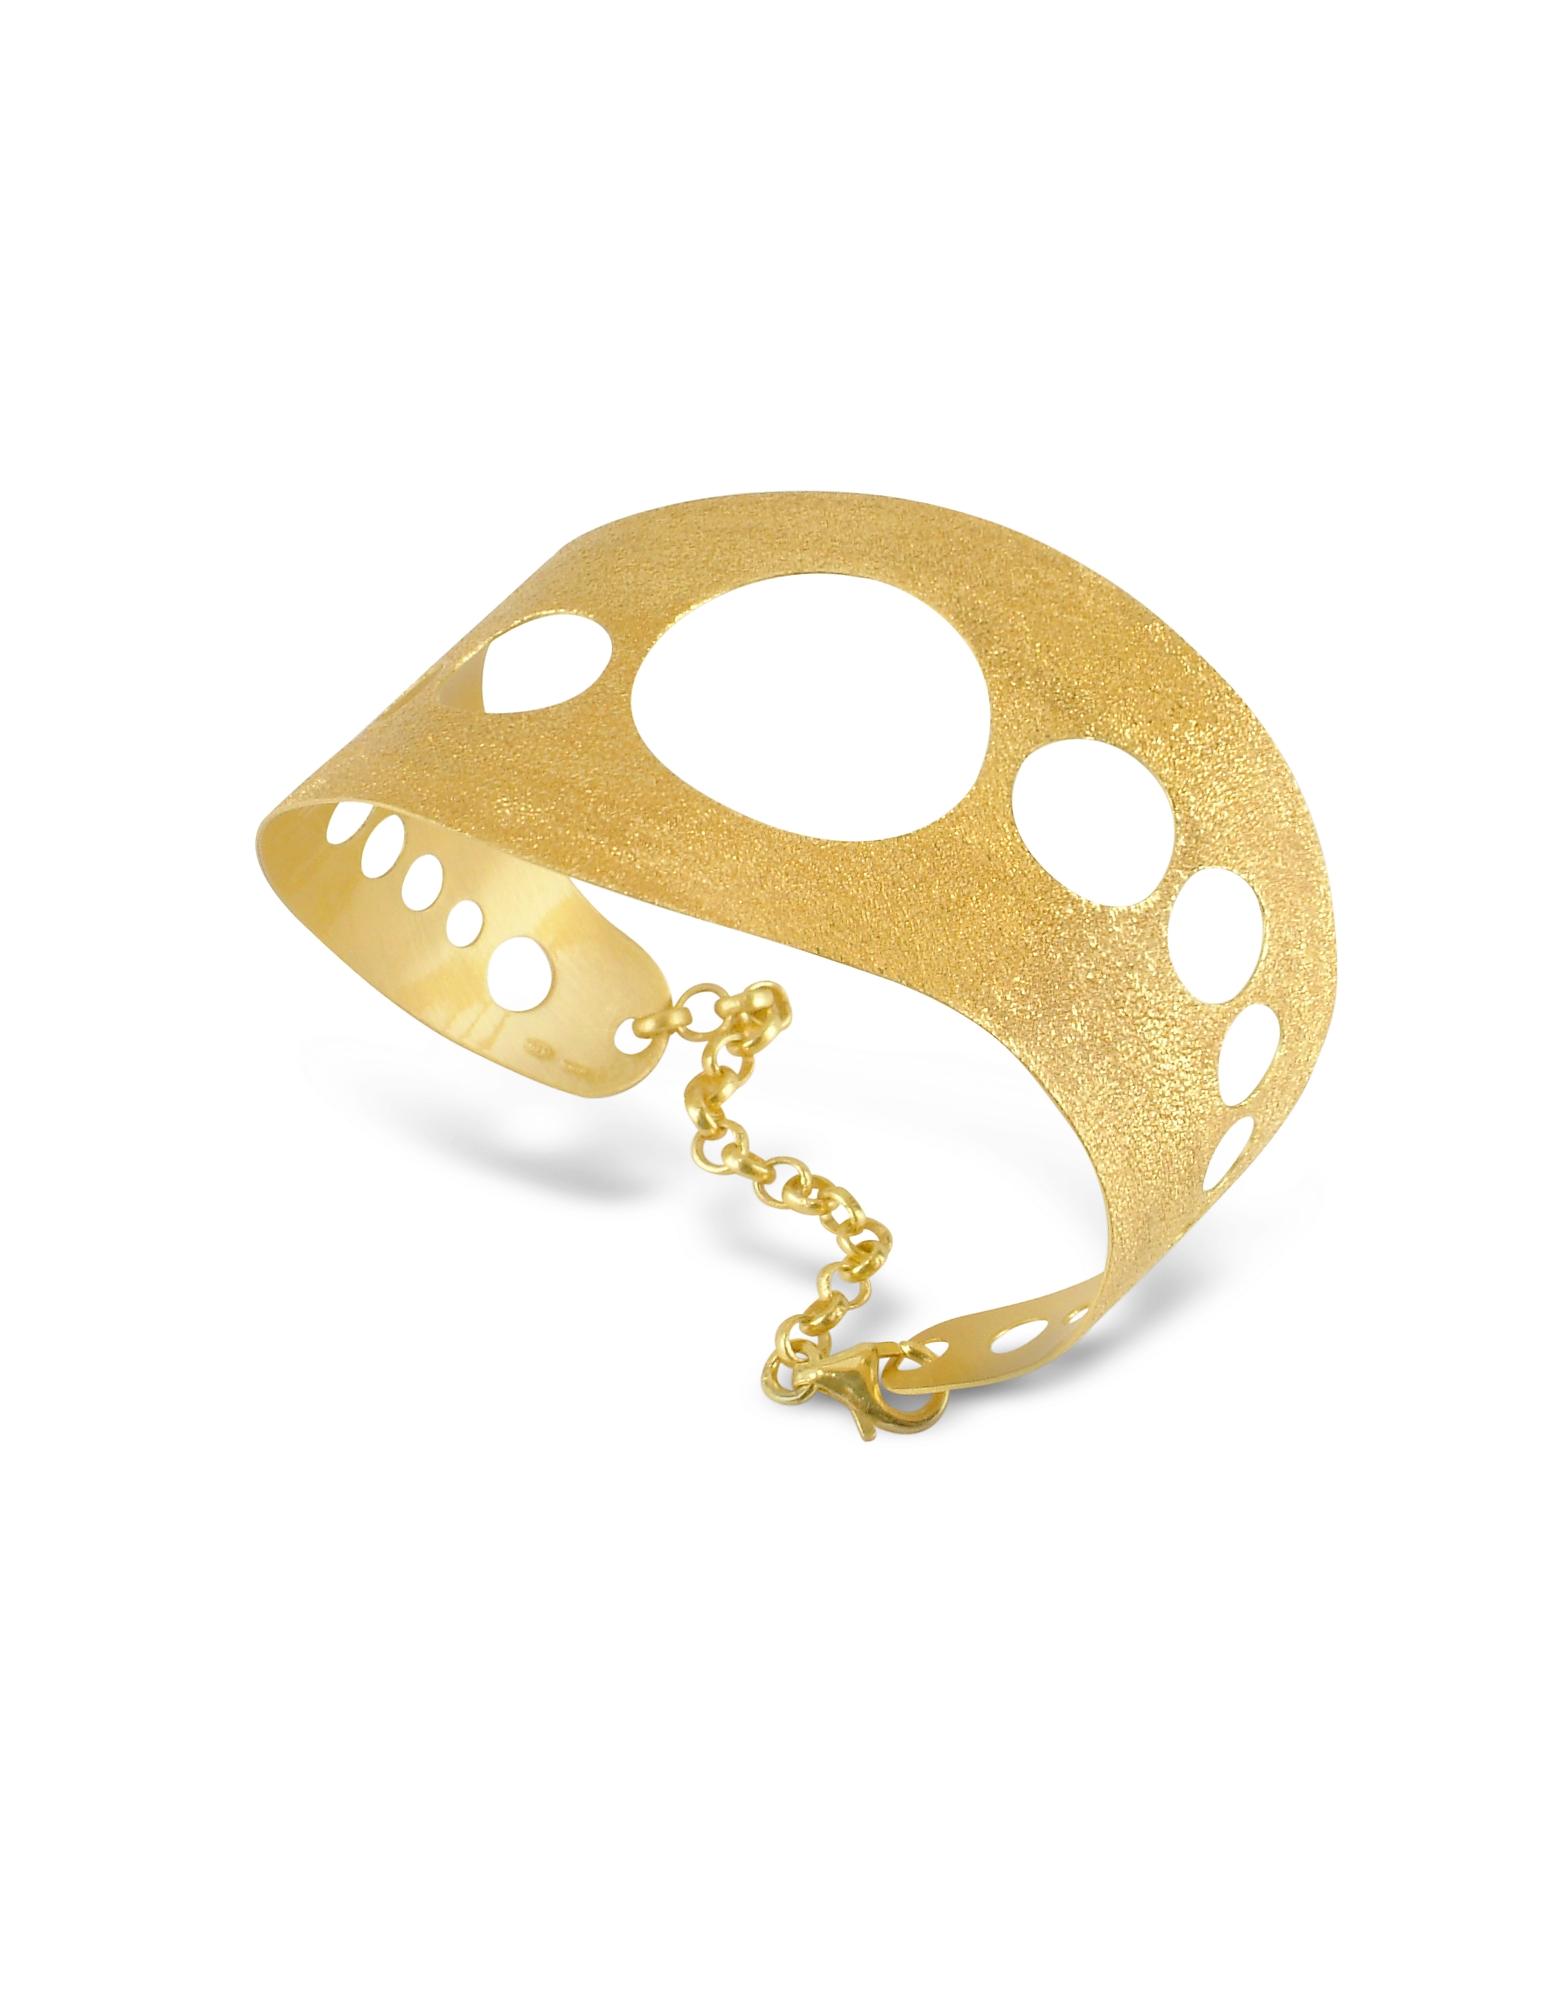 Stefano Patriarchi Bracelets, Golden Silver Etched Cut Out Cuff Bracelet